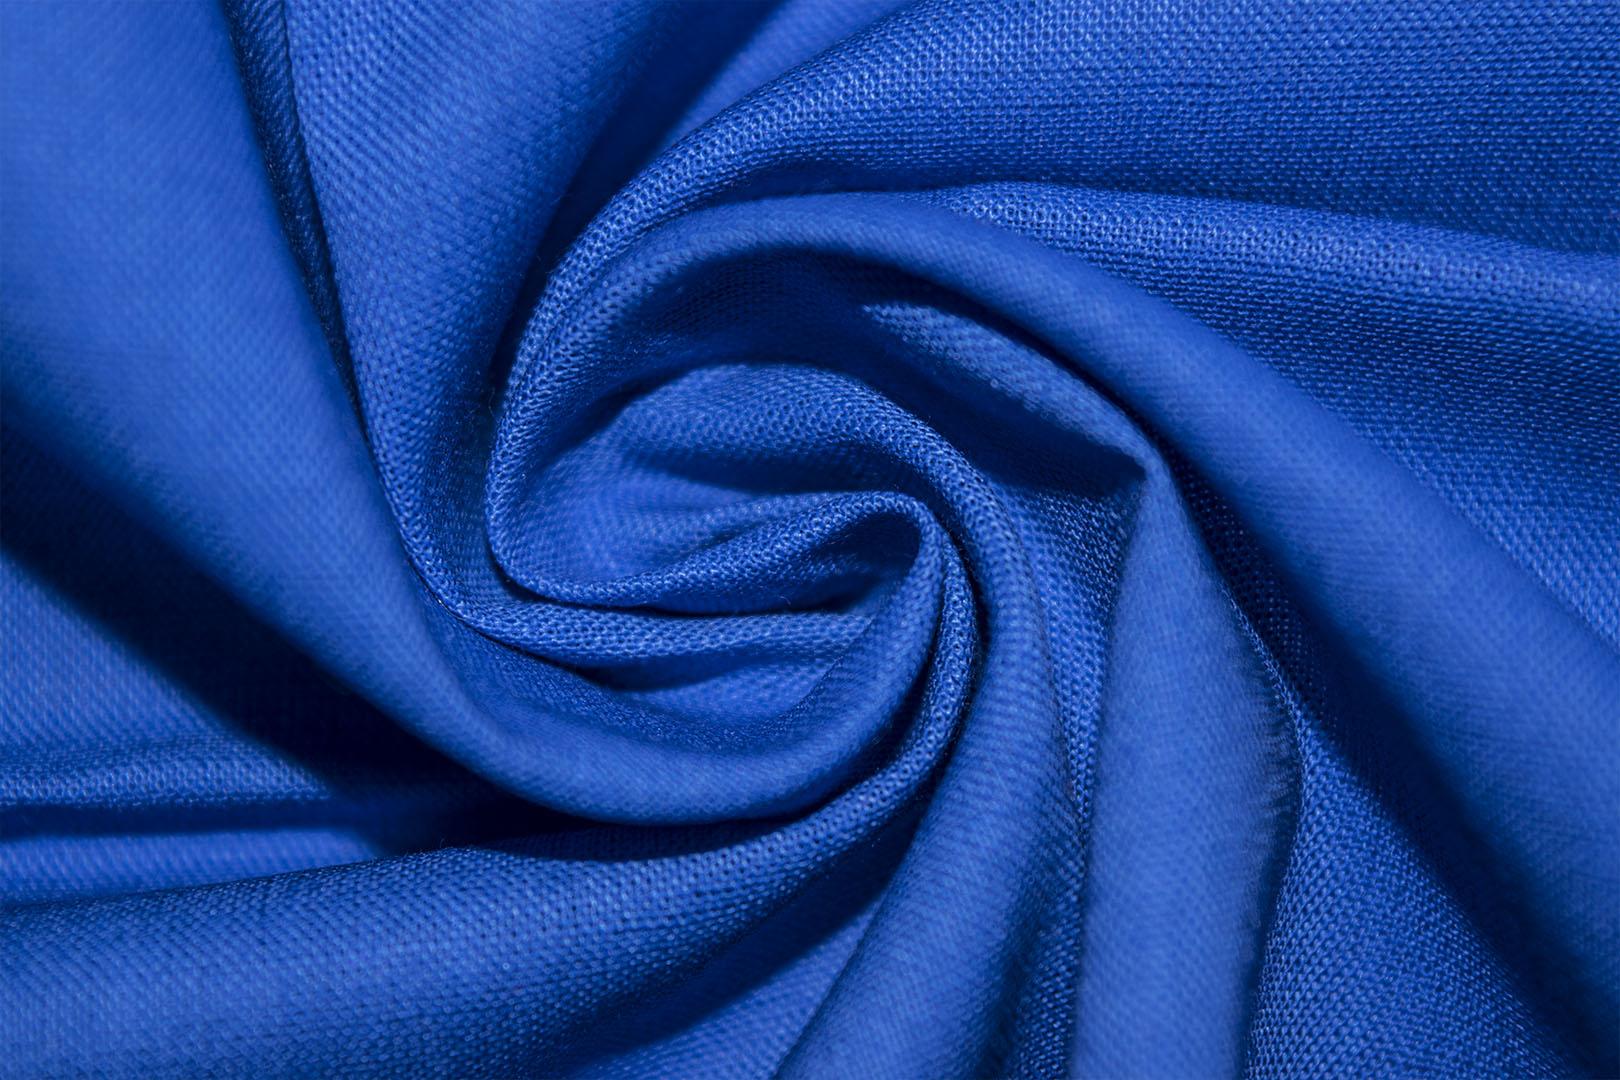 homespun_blue62378   4/28